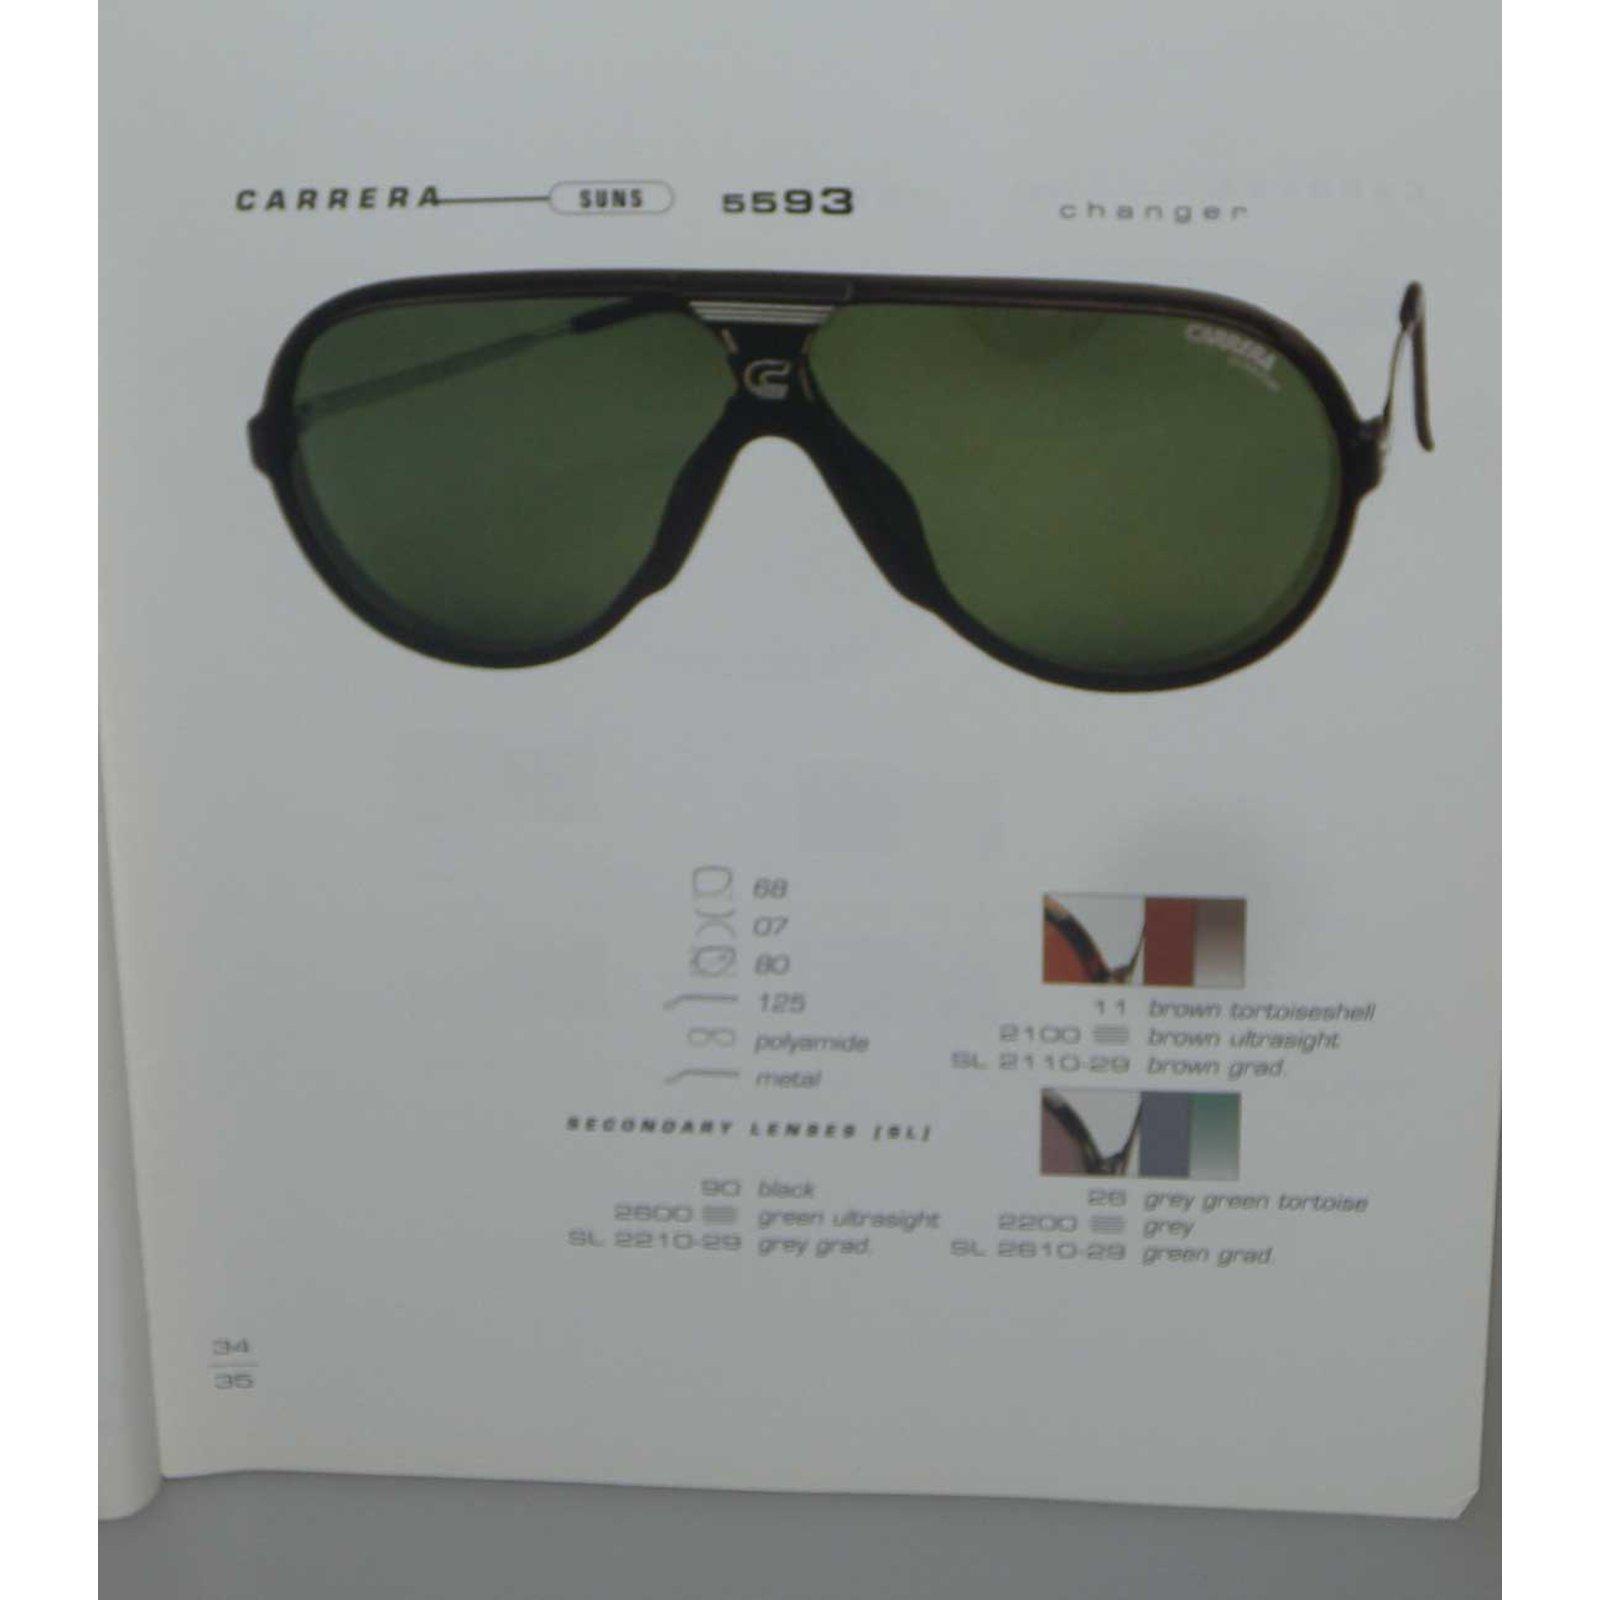 9220a910df15f Carrera Sunglasses Sunglasses Metal